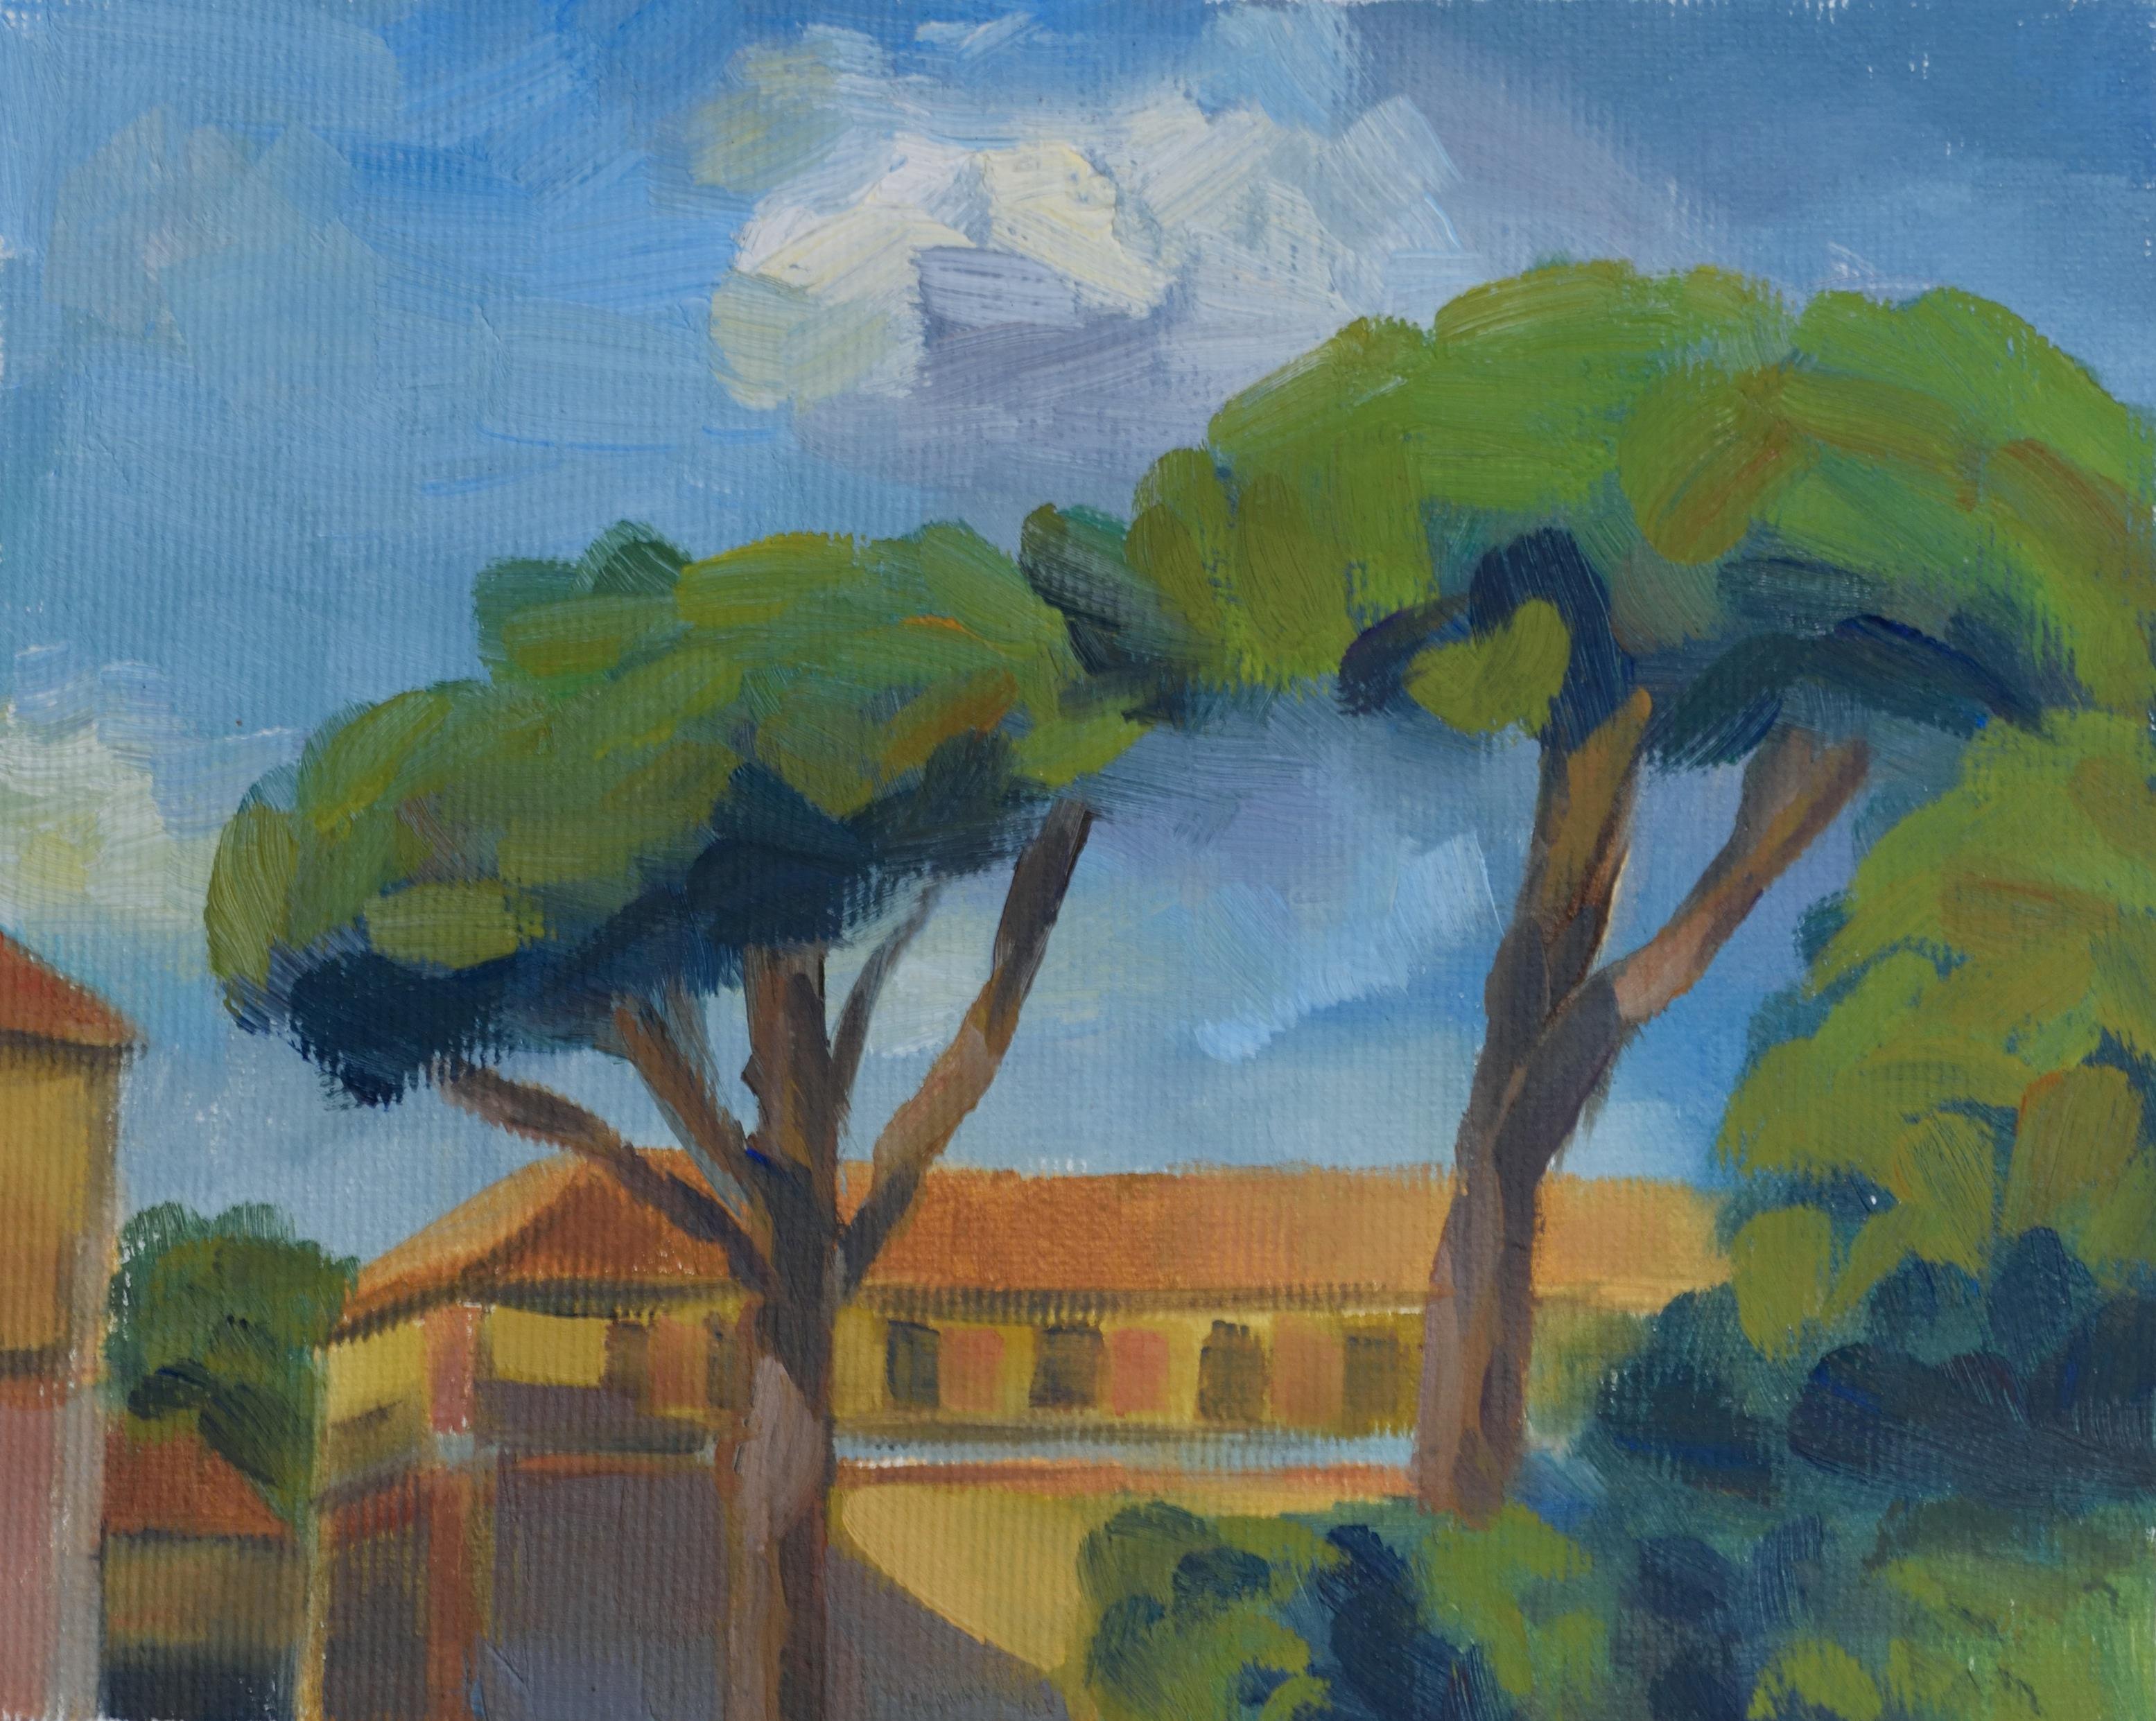 Piazzale delle Cascine, oil on canvas, 15 x 18 cm, 2017